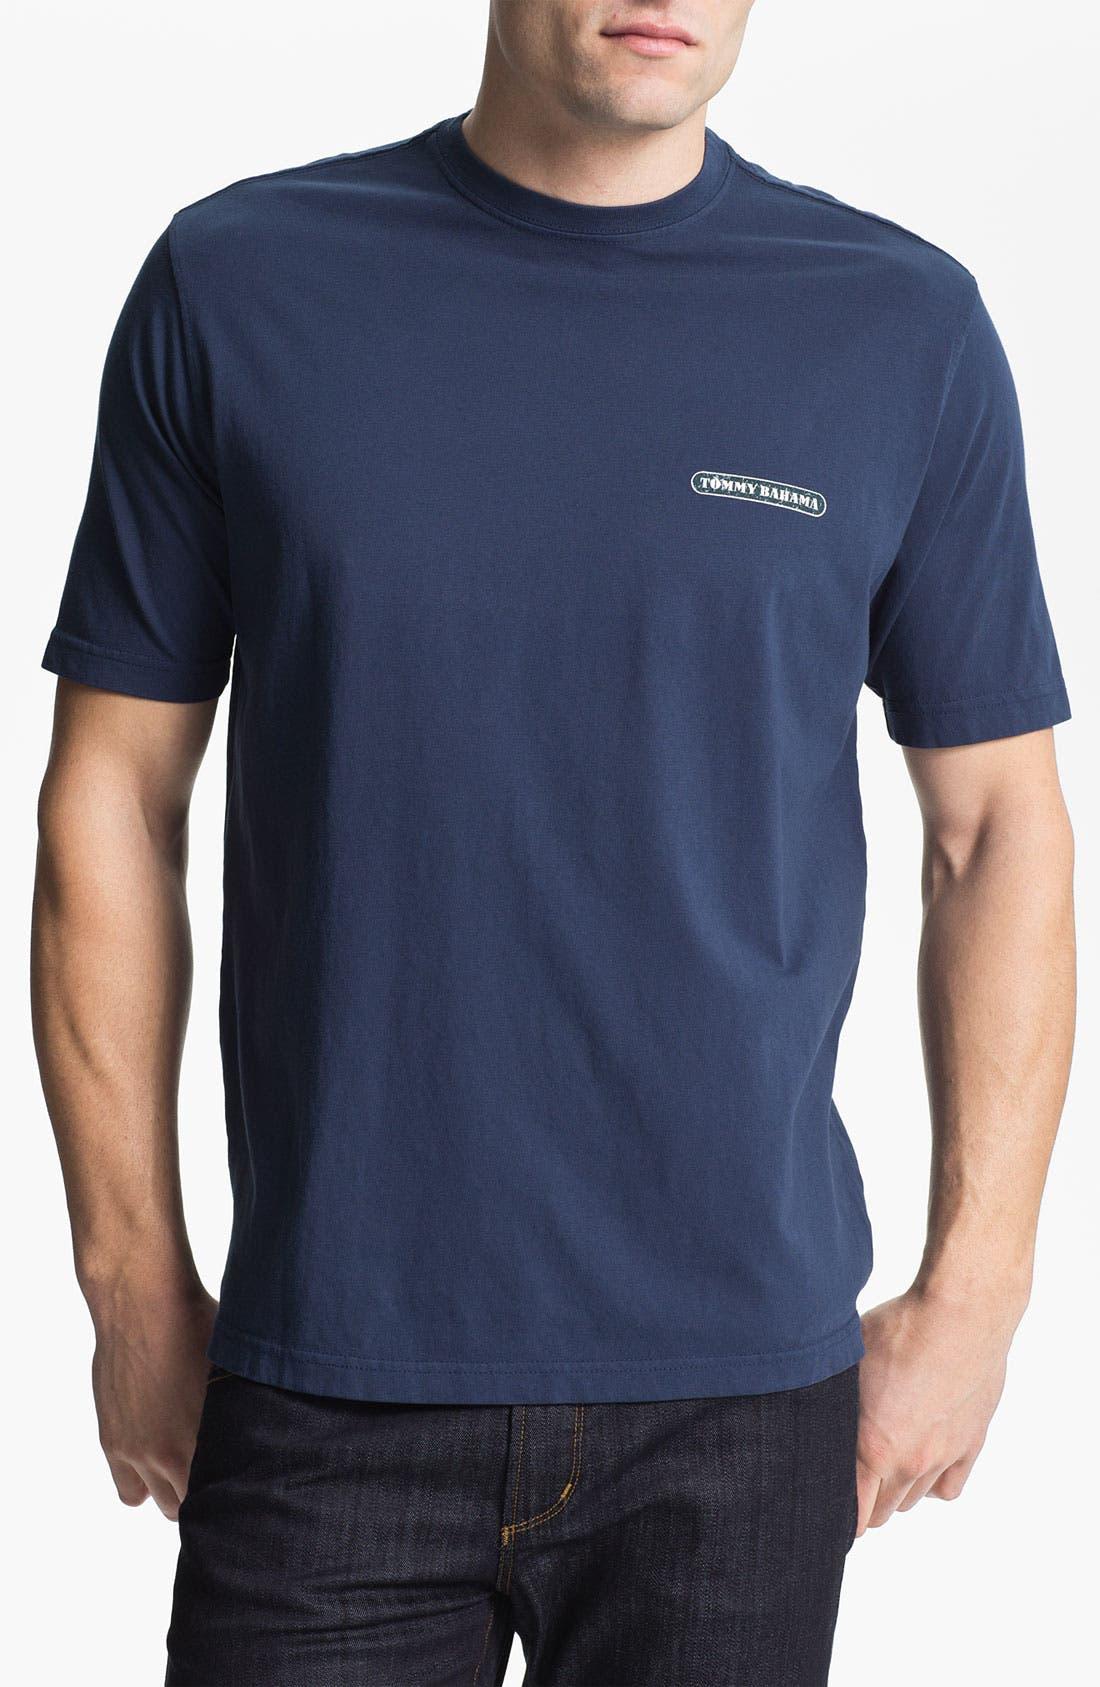 Alternate Image 1 Selected - Tommy Bahama 'Holiday Lights' T-Shirt